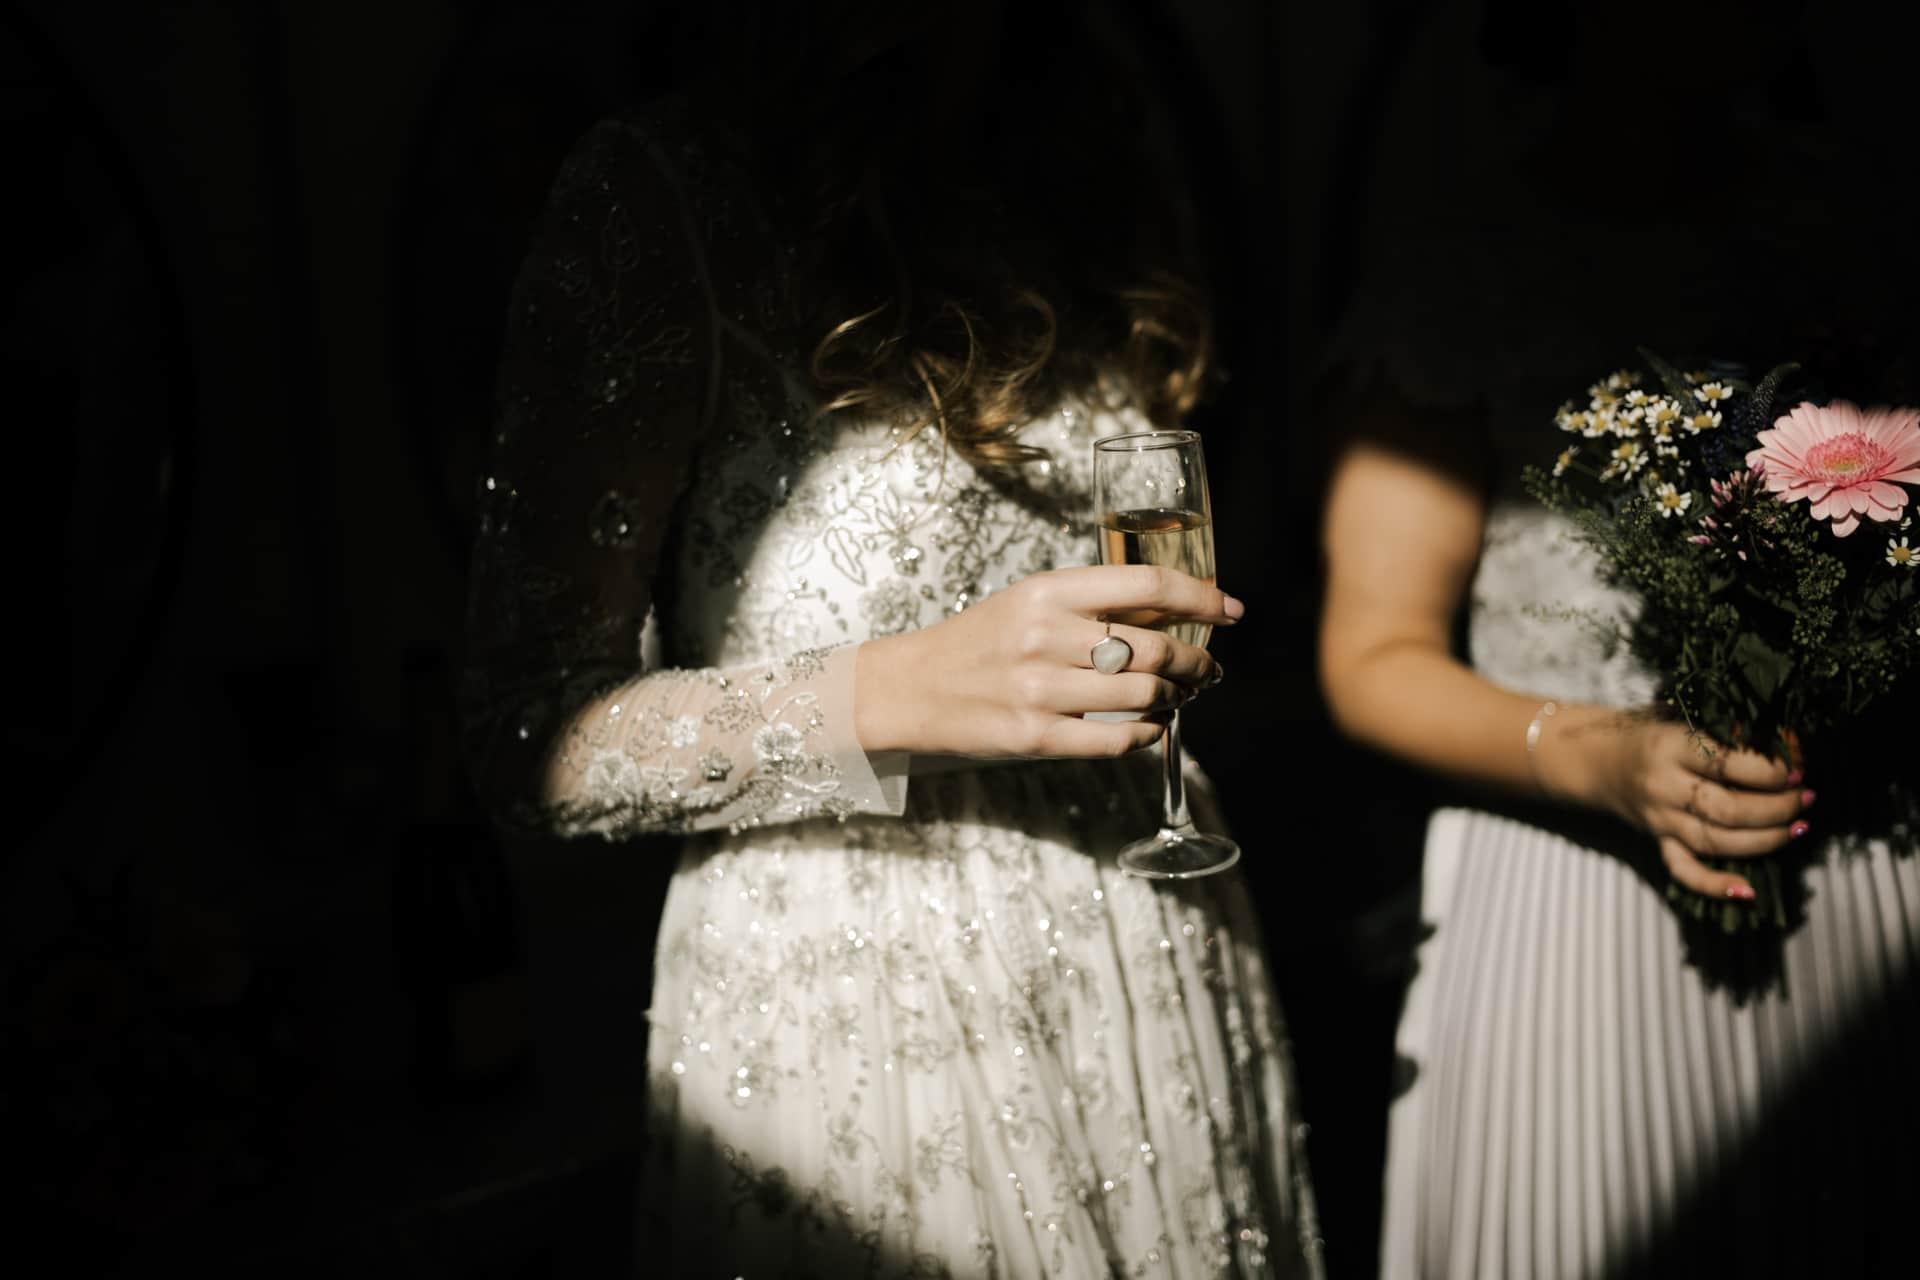 Bride holding champagne flute